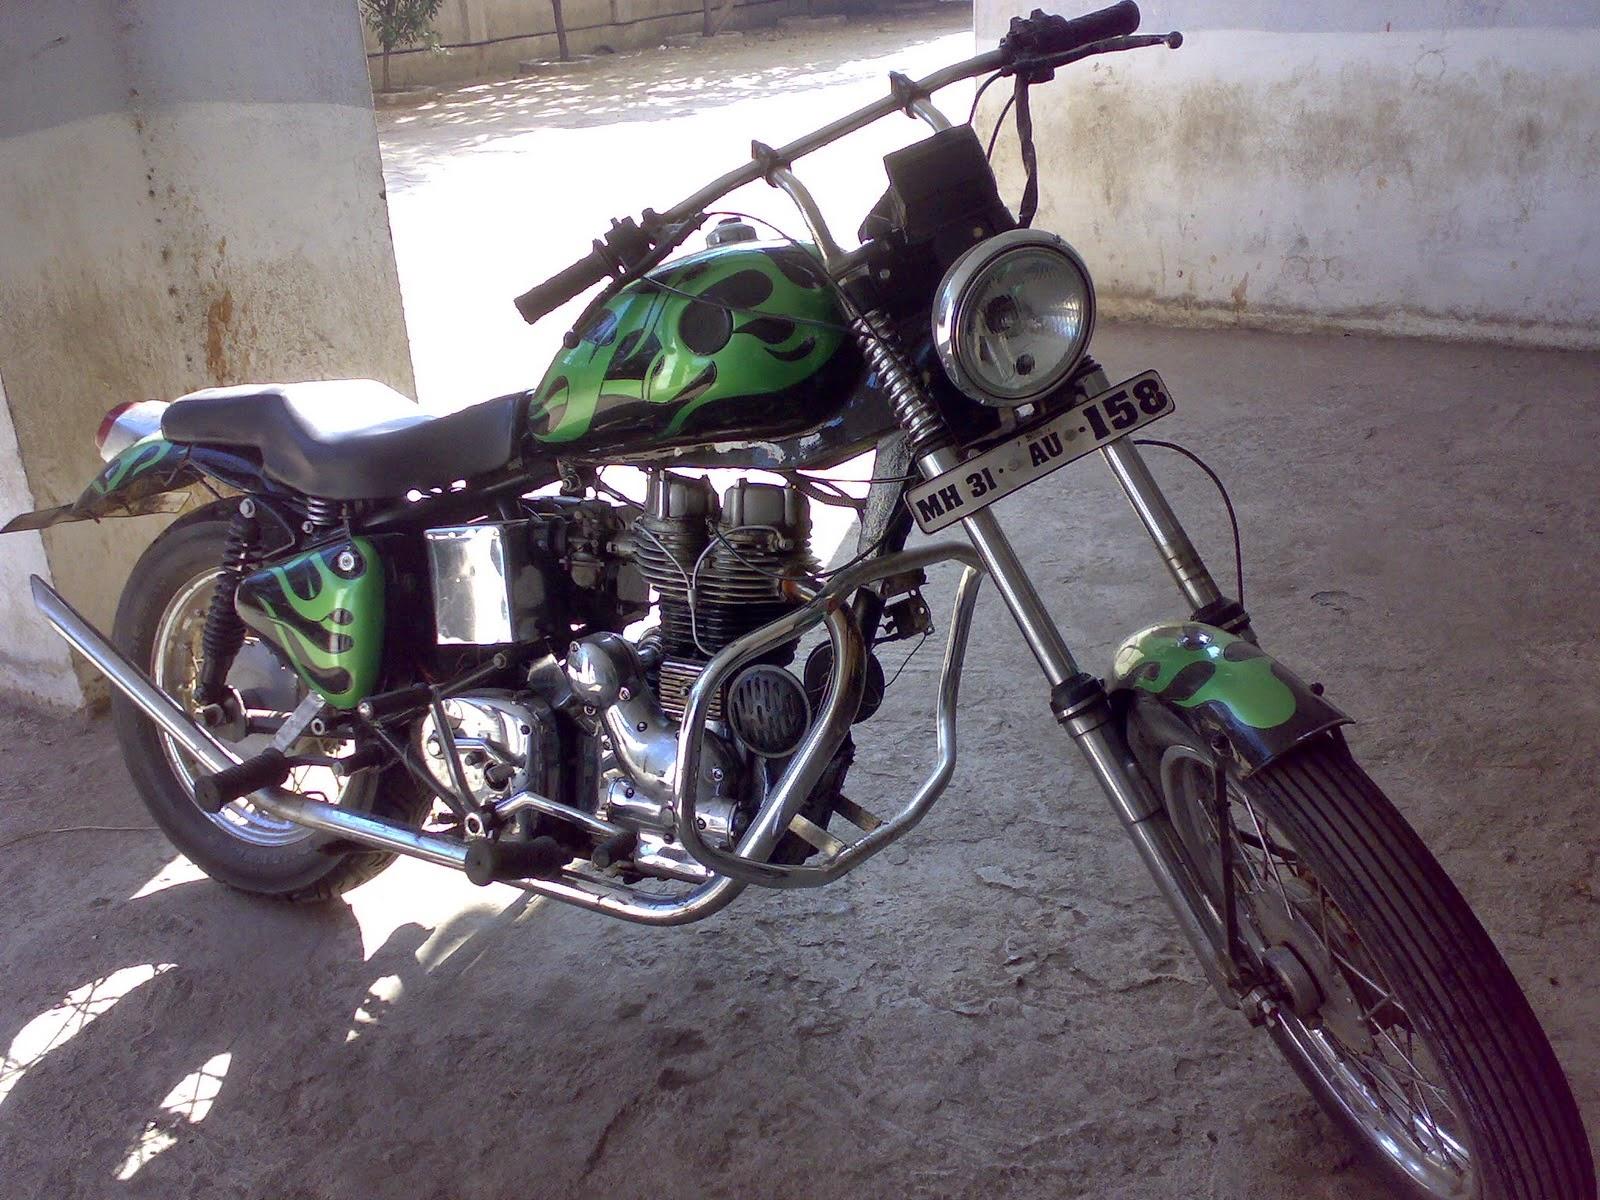 Modified Bullet Bikes Around the World